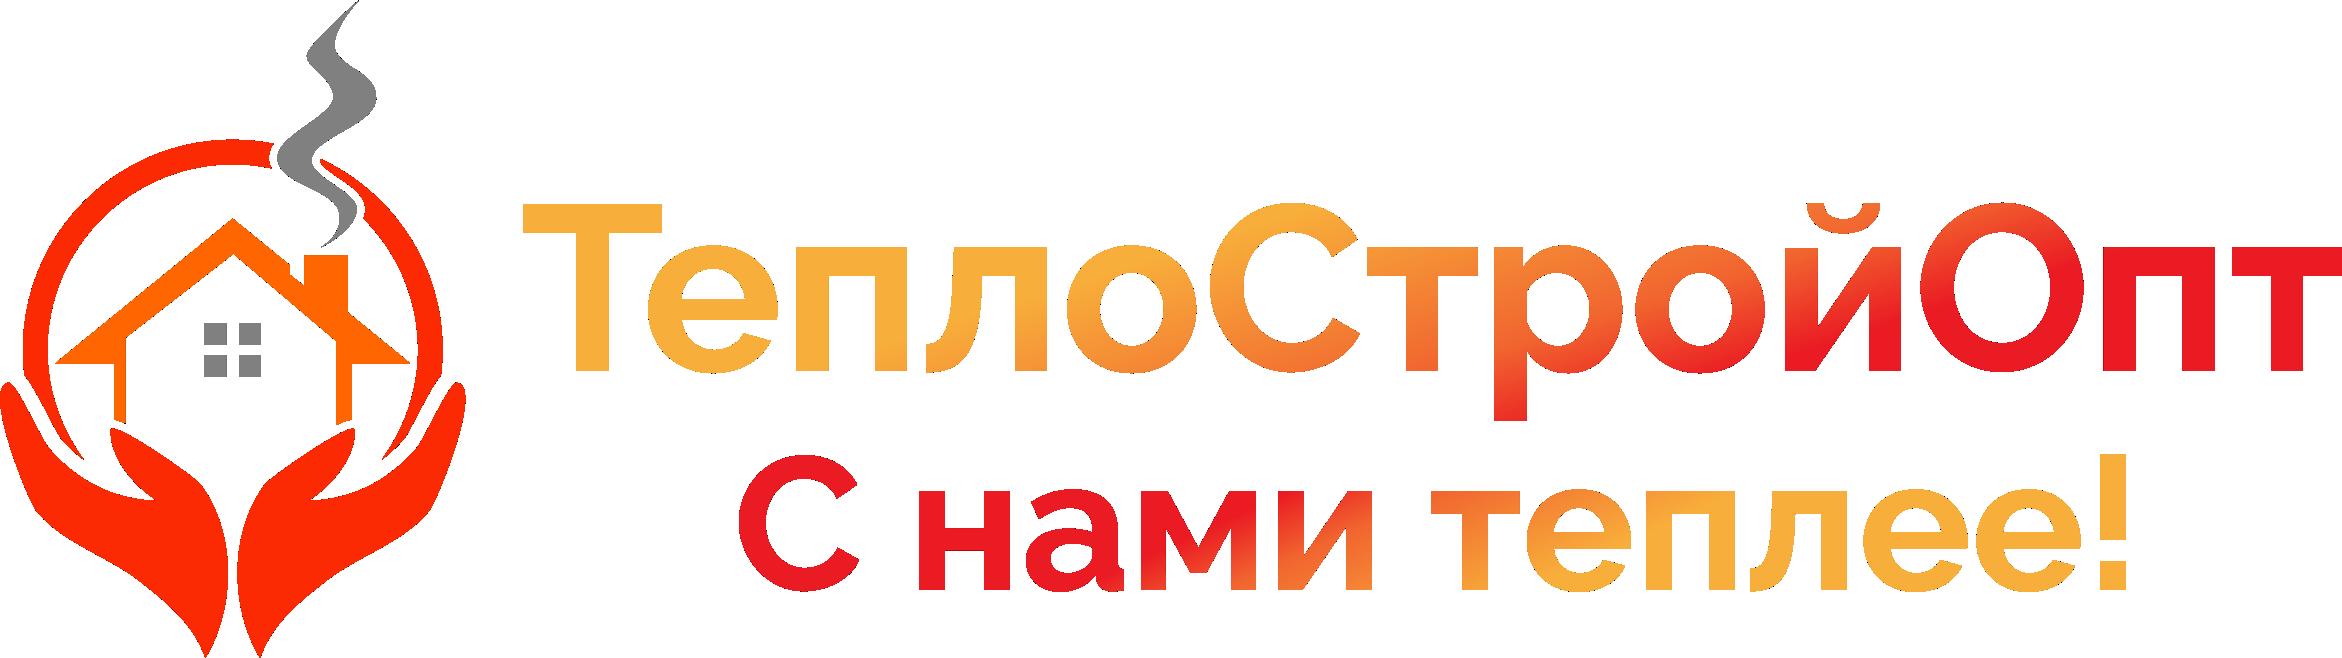 ТеплоСтройОпт